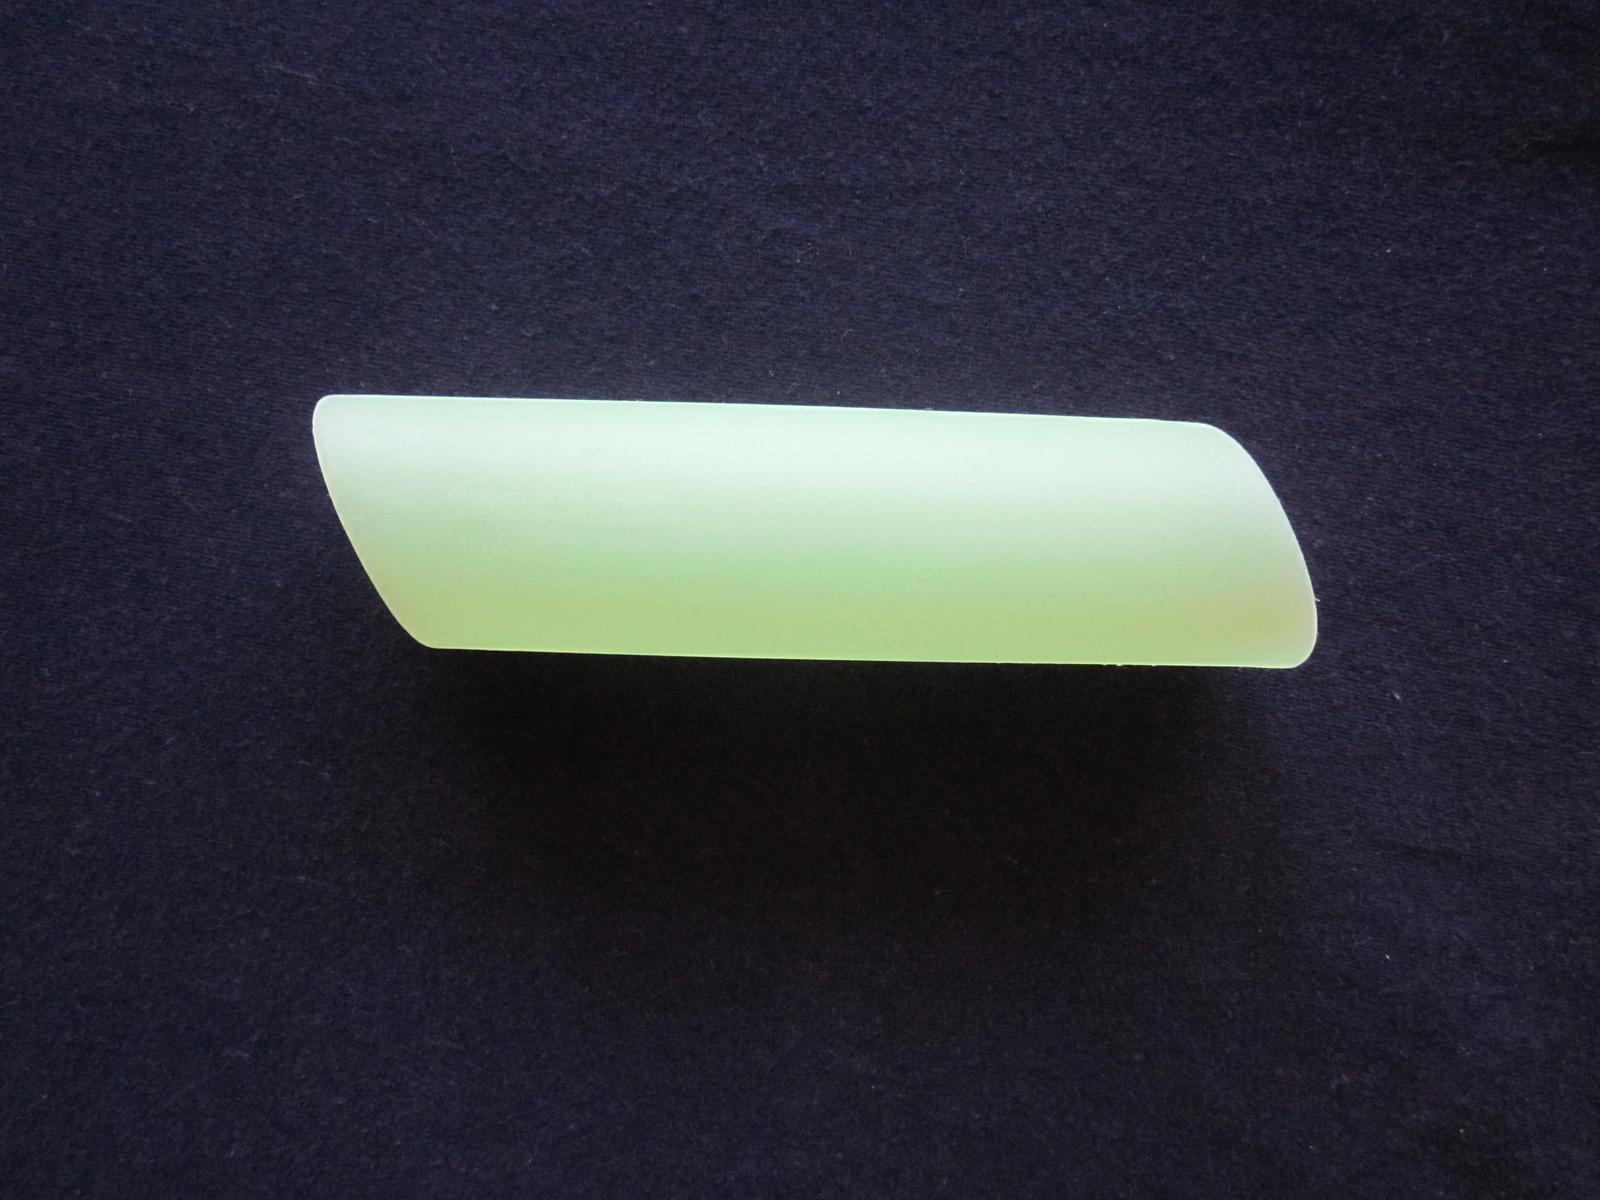 Lúpačka na cesnak zn. Tescoma - Obrázok č. 1